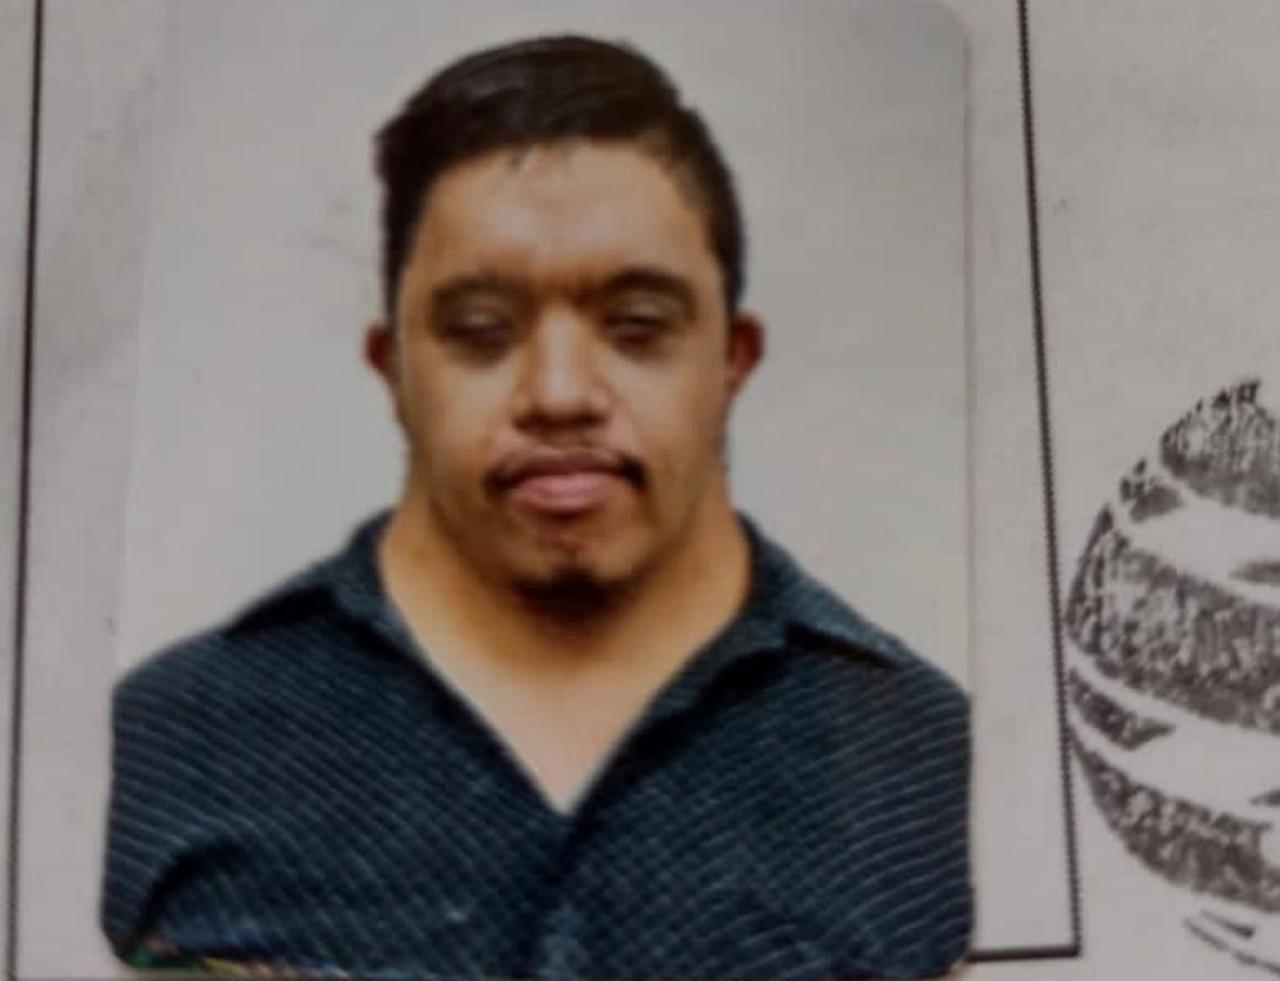 Solicitan colaboración para localizar a varón extraviado en Durango